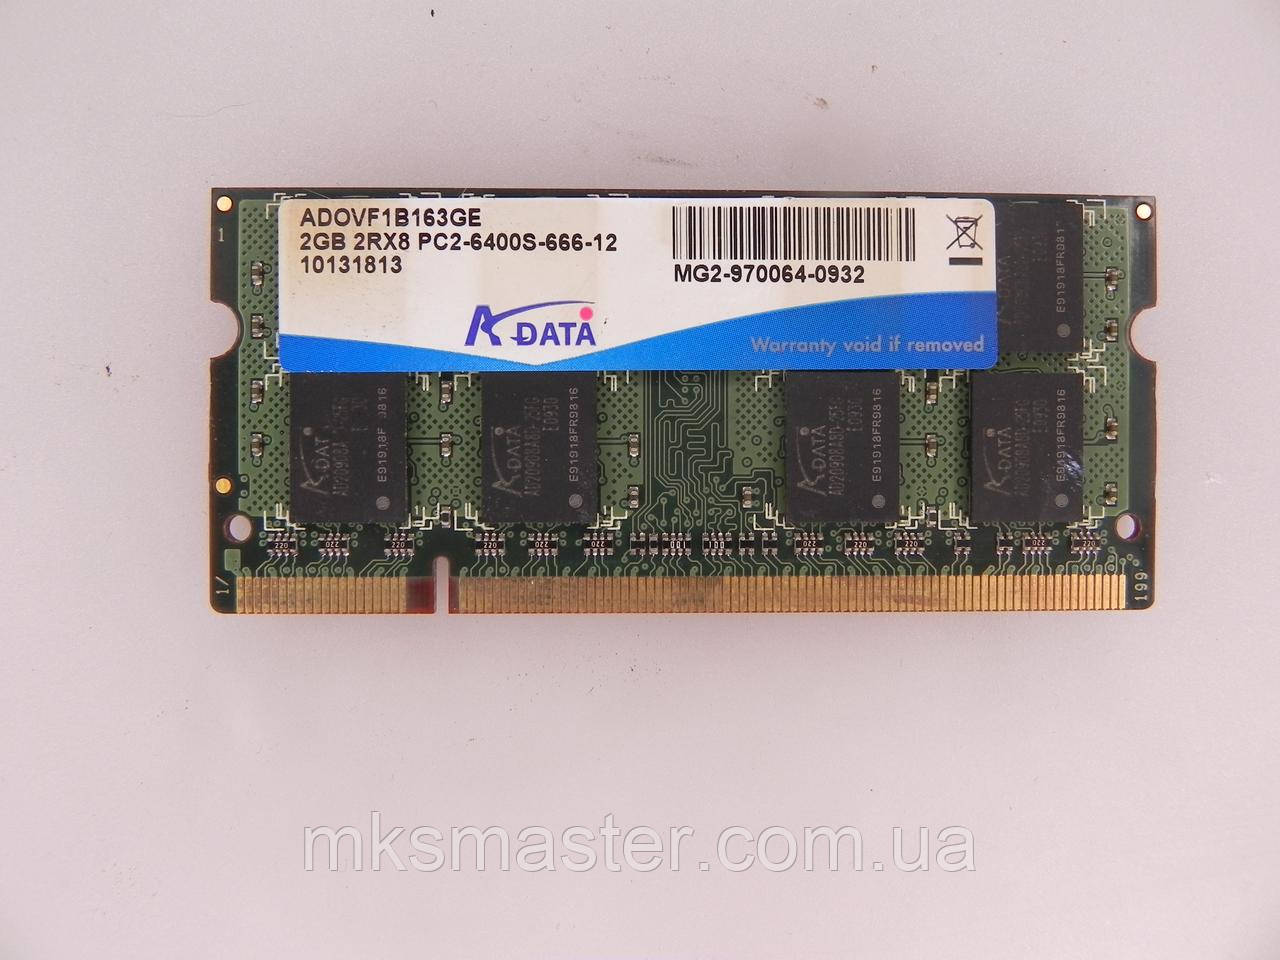 SODIMM DDR2 PC2 2GB оперативная память Adata ADOVF1B163GE, PC2-6400S-666-12, 2GB 2RX8  для ноутбука. бу